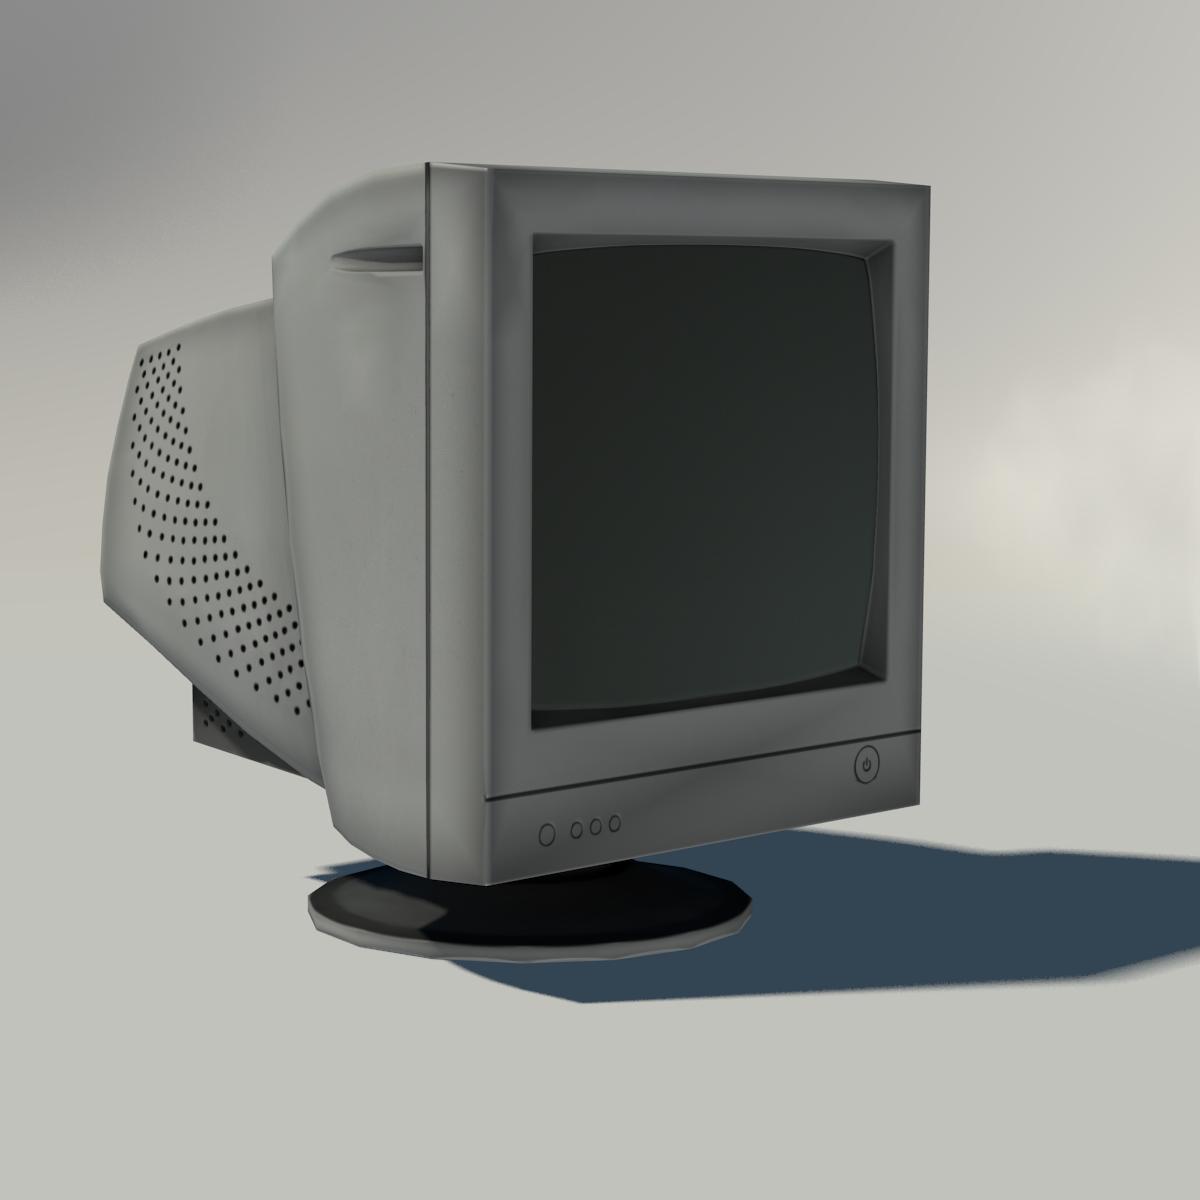 Old Crt Monitor Monitor Crt Tv Monitor